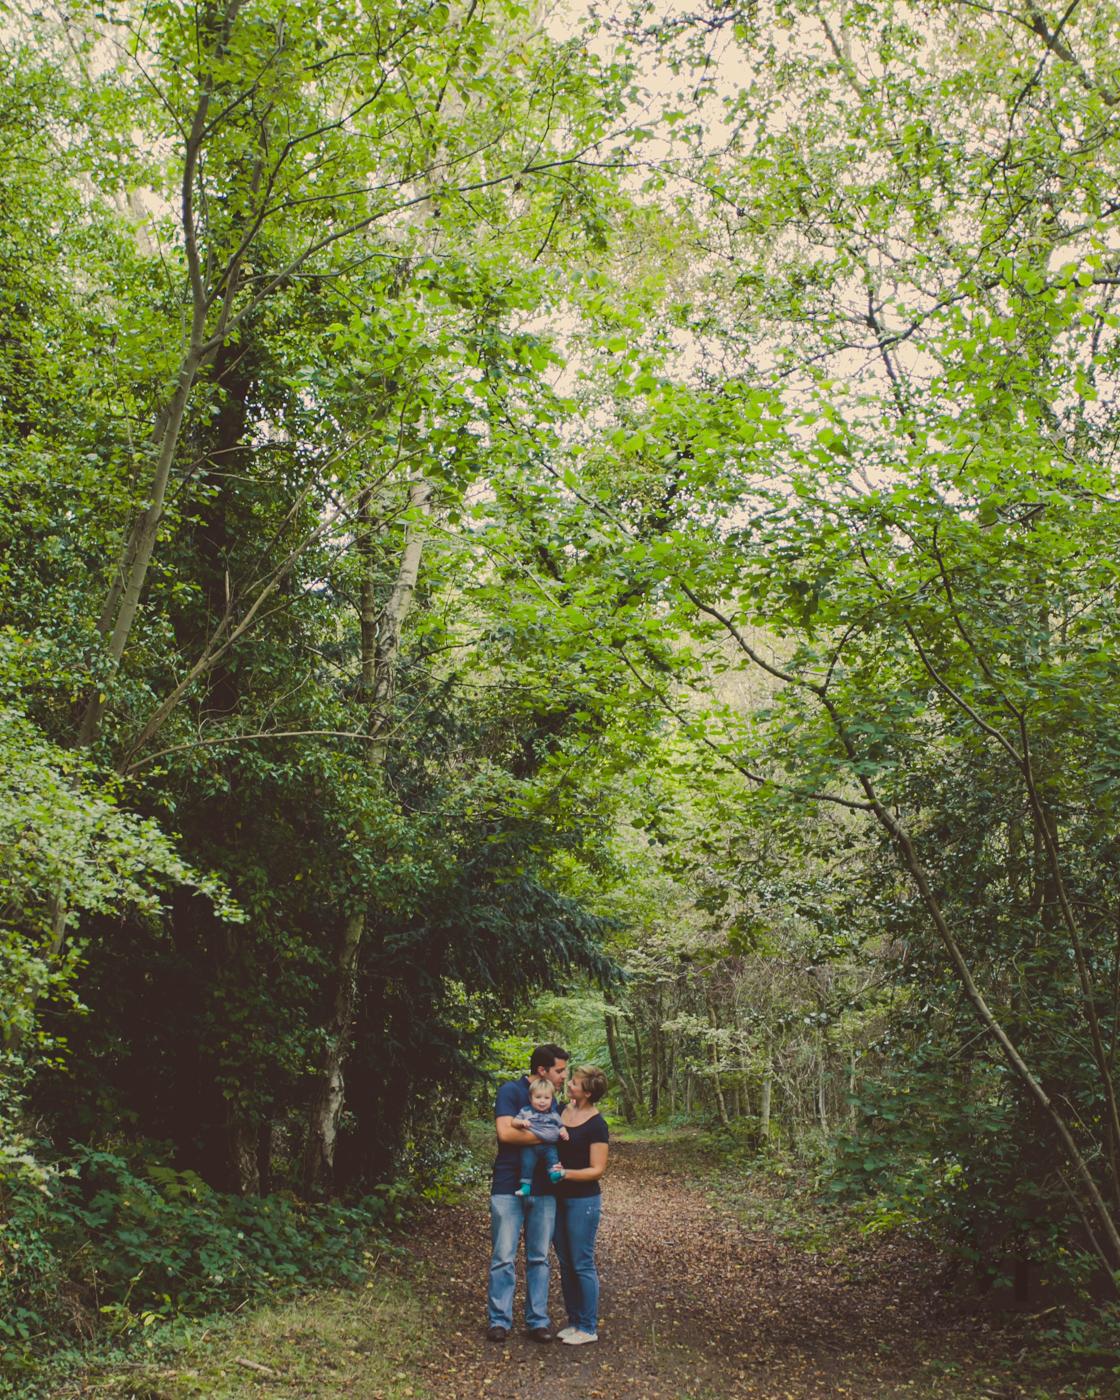 023 - Kelly, Matthew and Hugo Fine Art Family Photography by www.mpmedia.co.uk -127.JPG